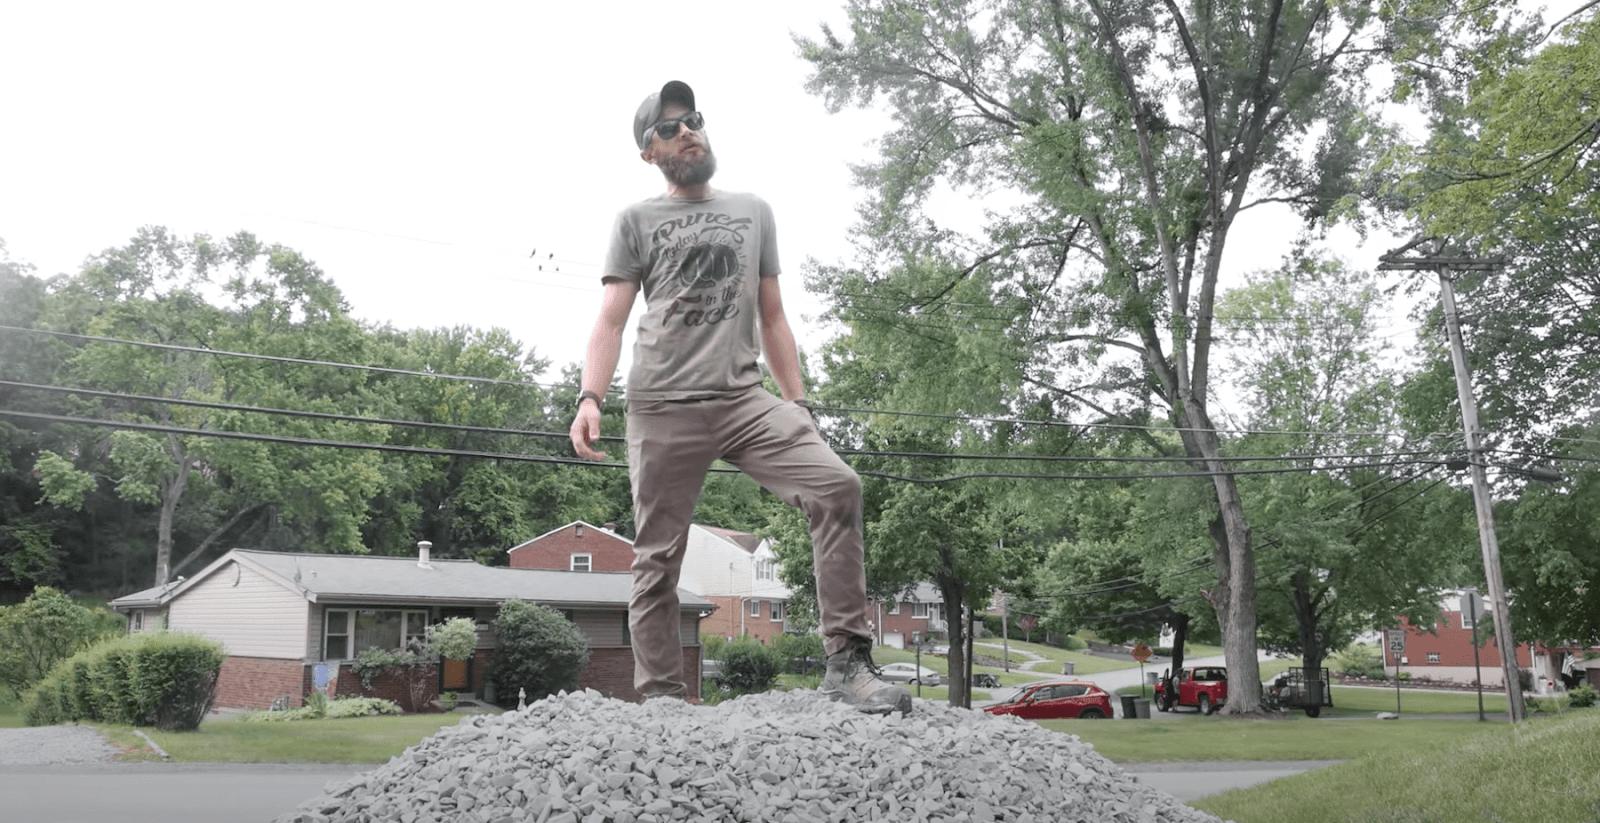 Sam standing on a pile of gravel